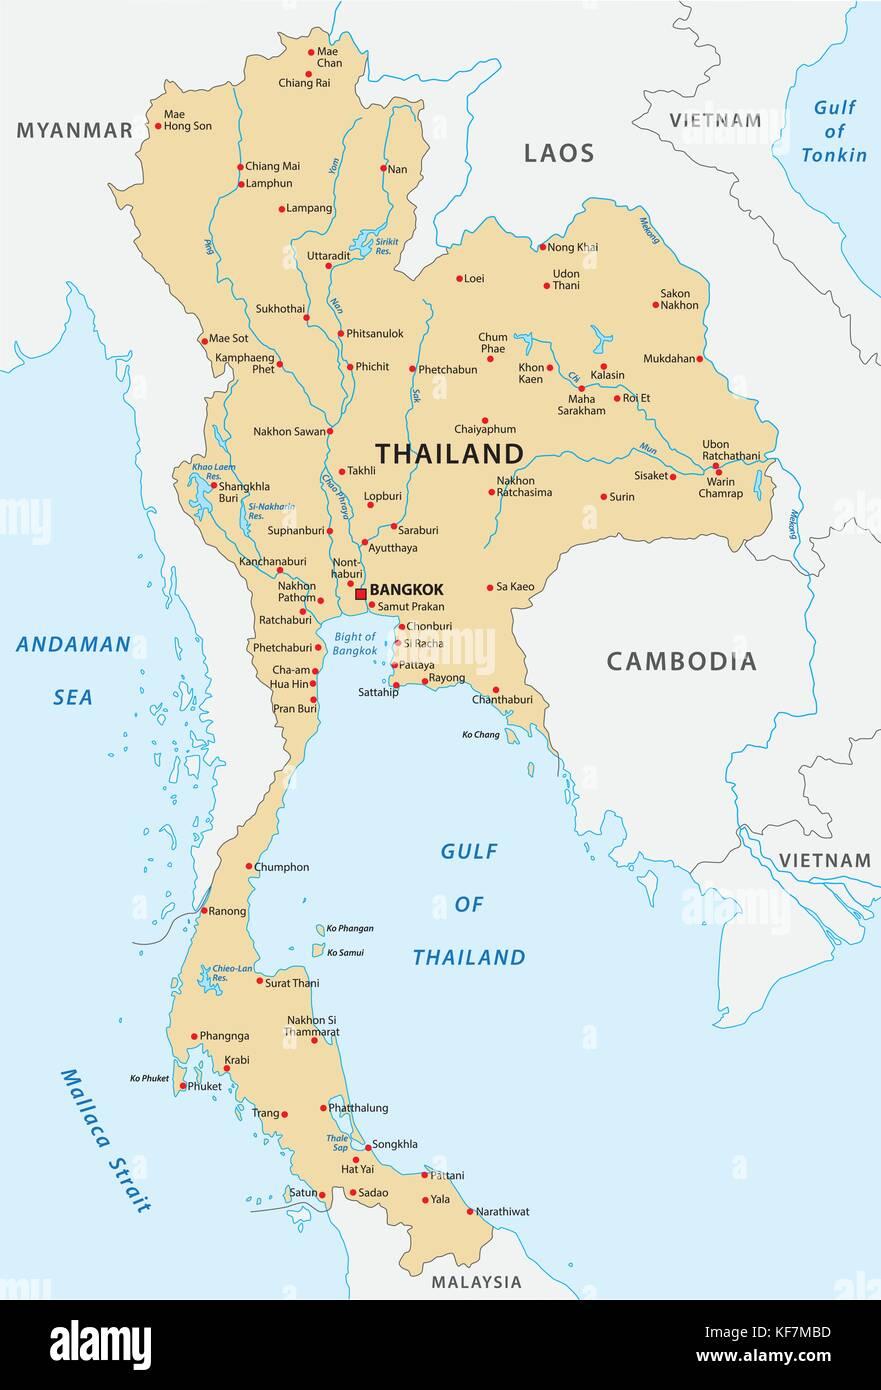 thailand vector map Stock Vector Art & Illustration, Vector ...